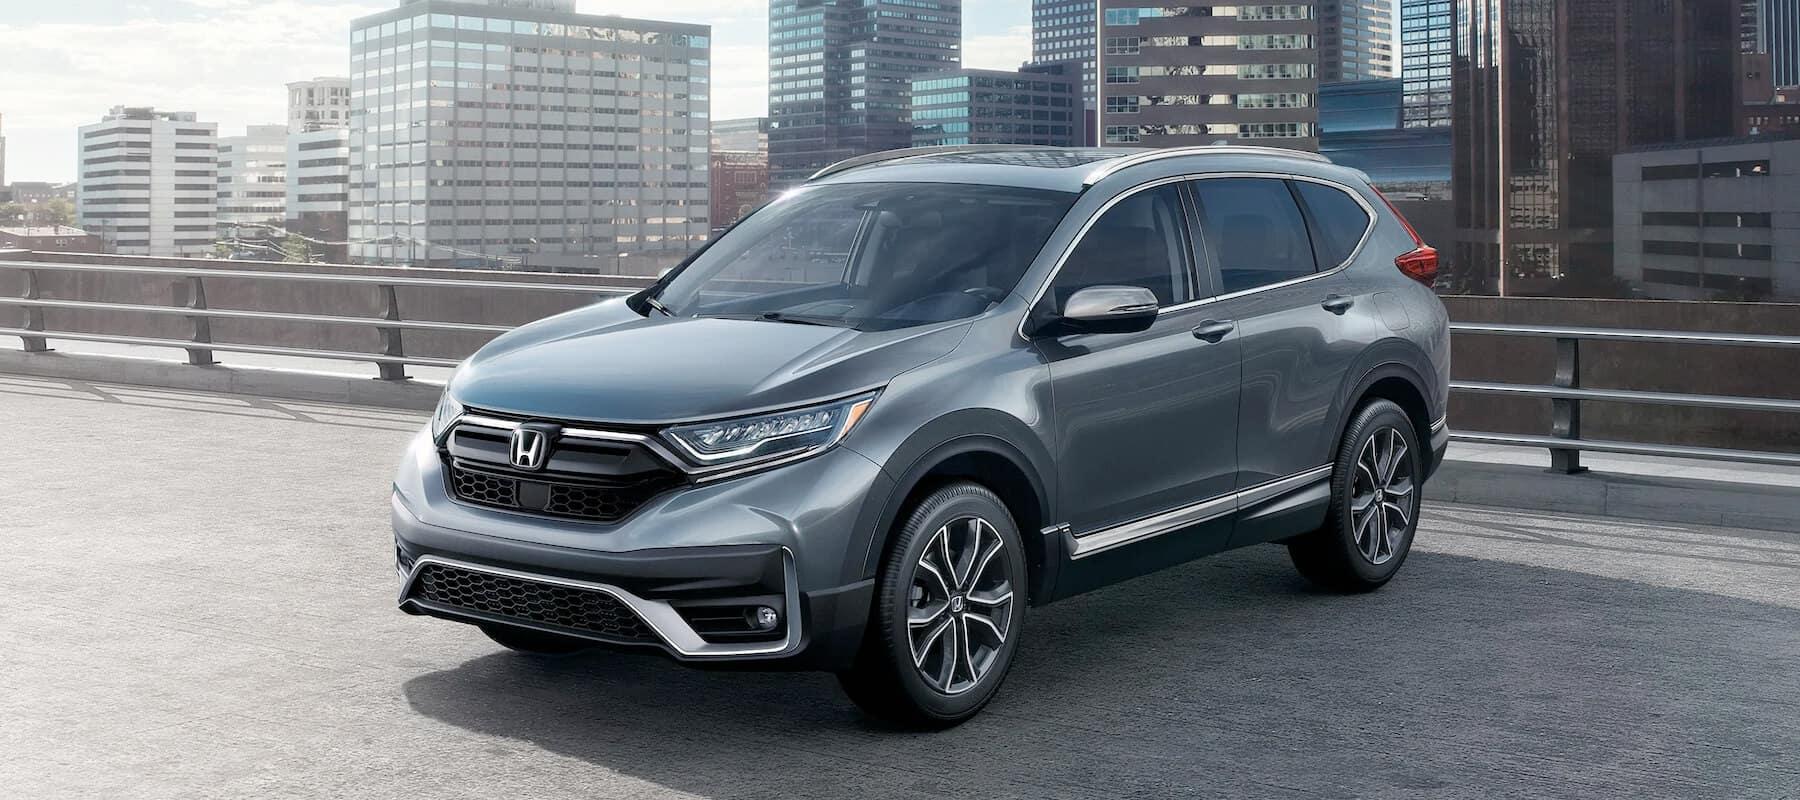 Introducing the New 2021 Honda CR-V Slider